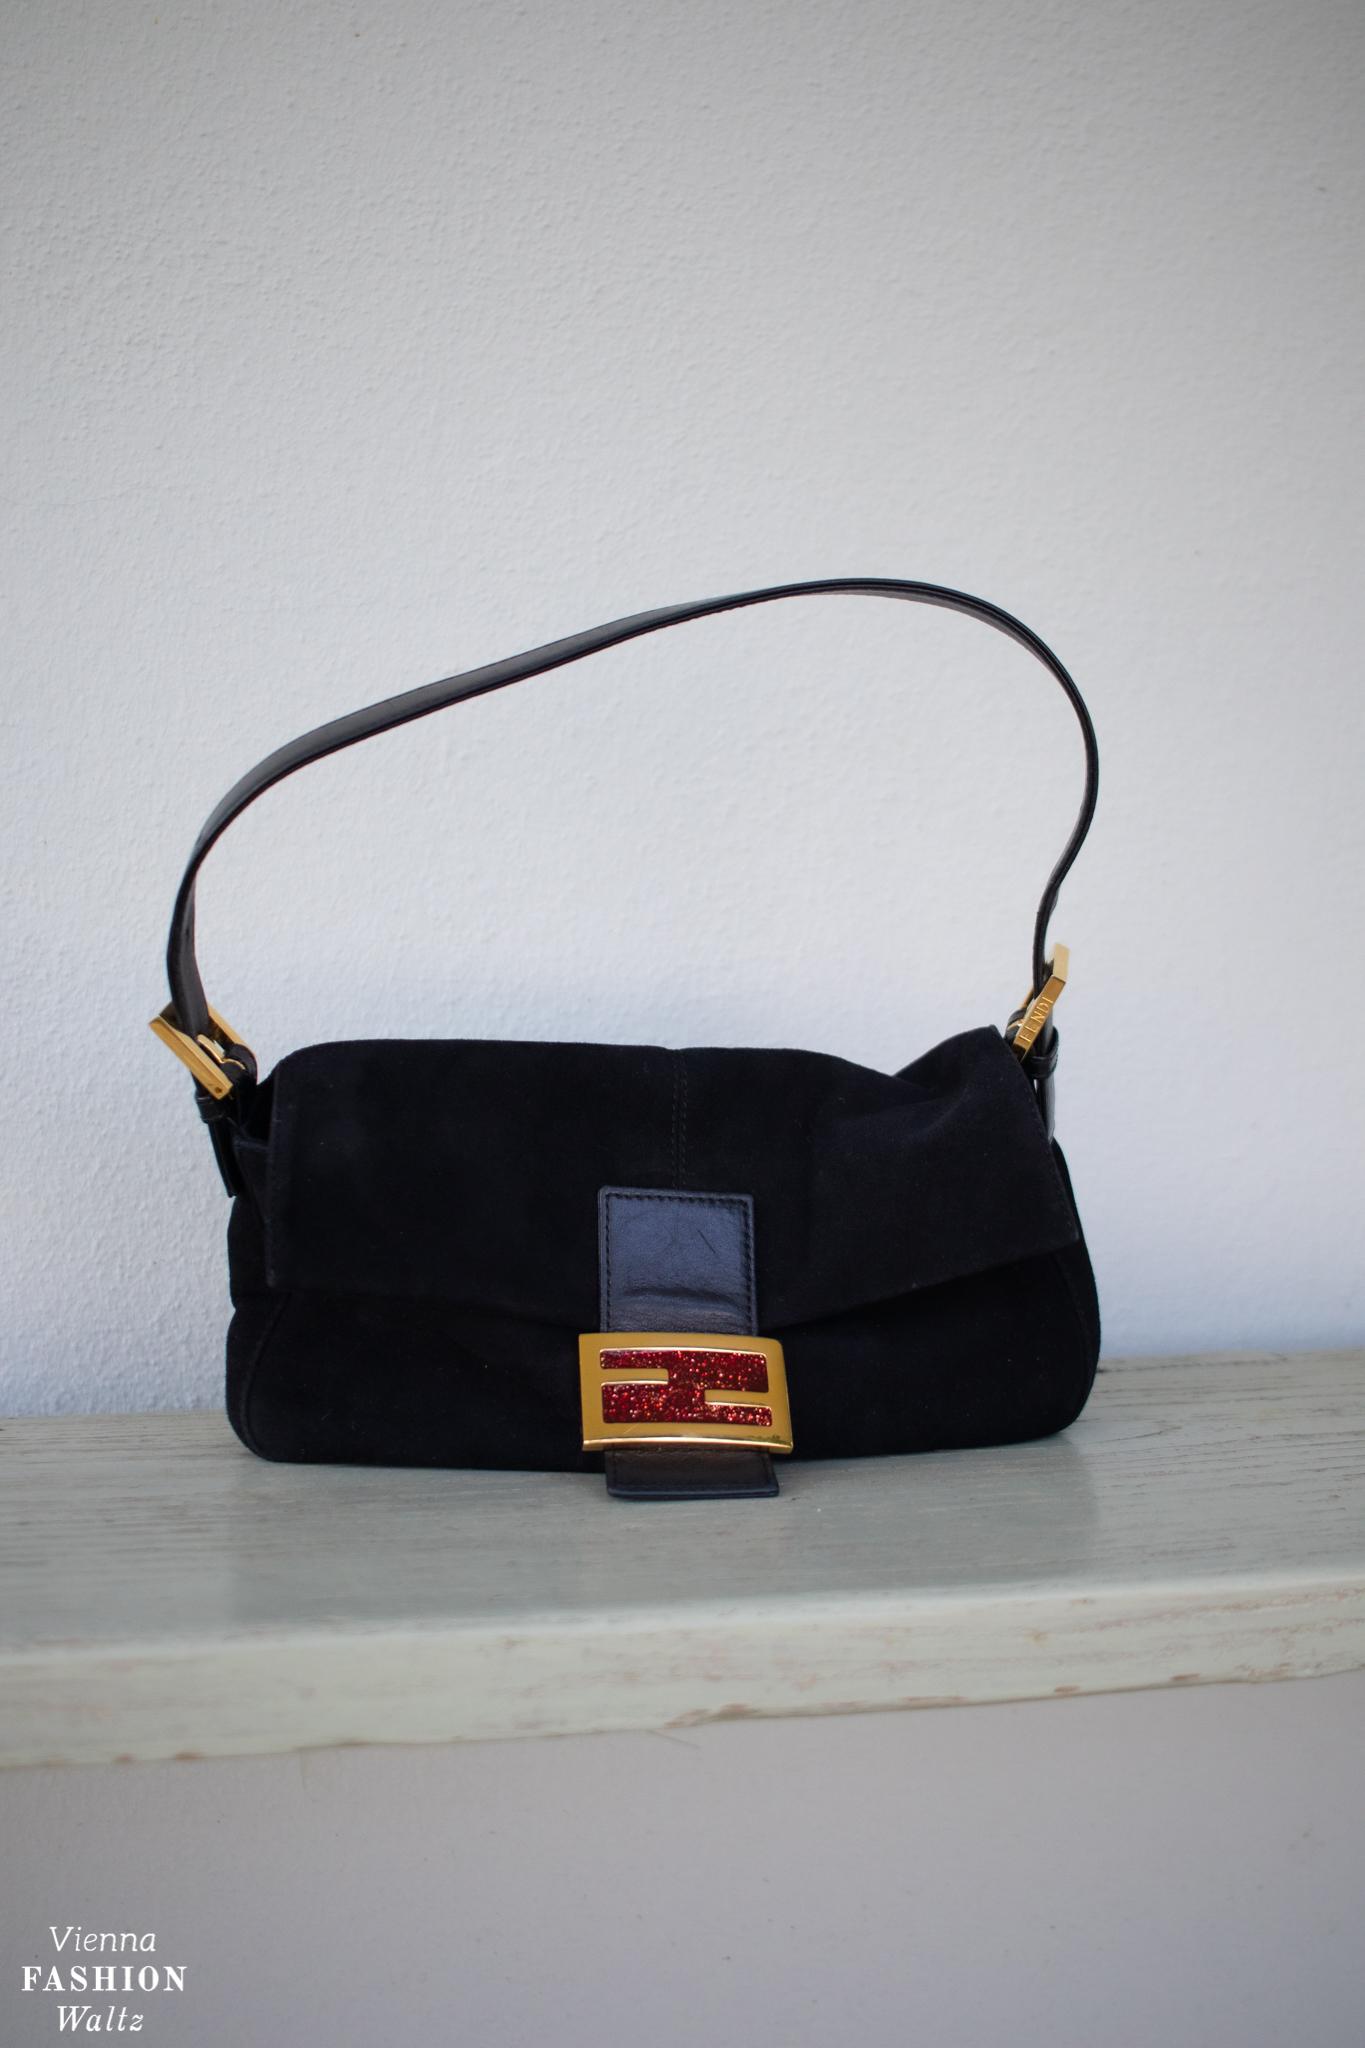 Vintage & Second Hand Schätze Fendi Baguette Vintage 90er Sex and the City Carrie Bradshaw Bag